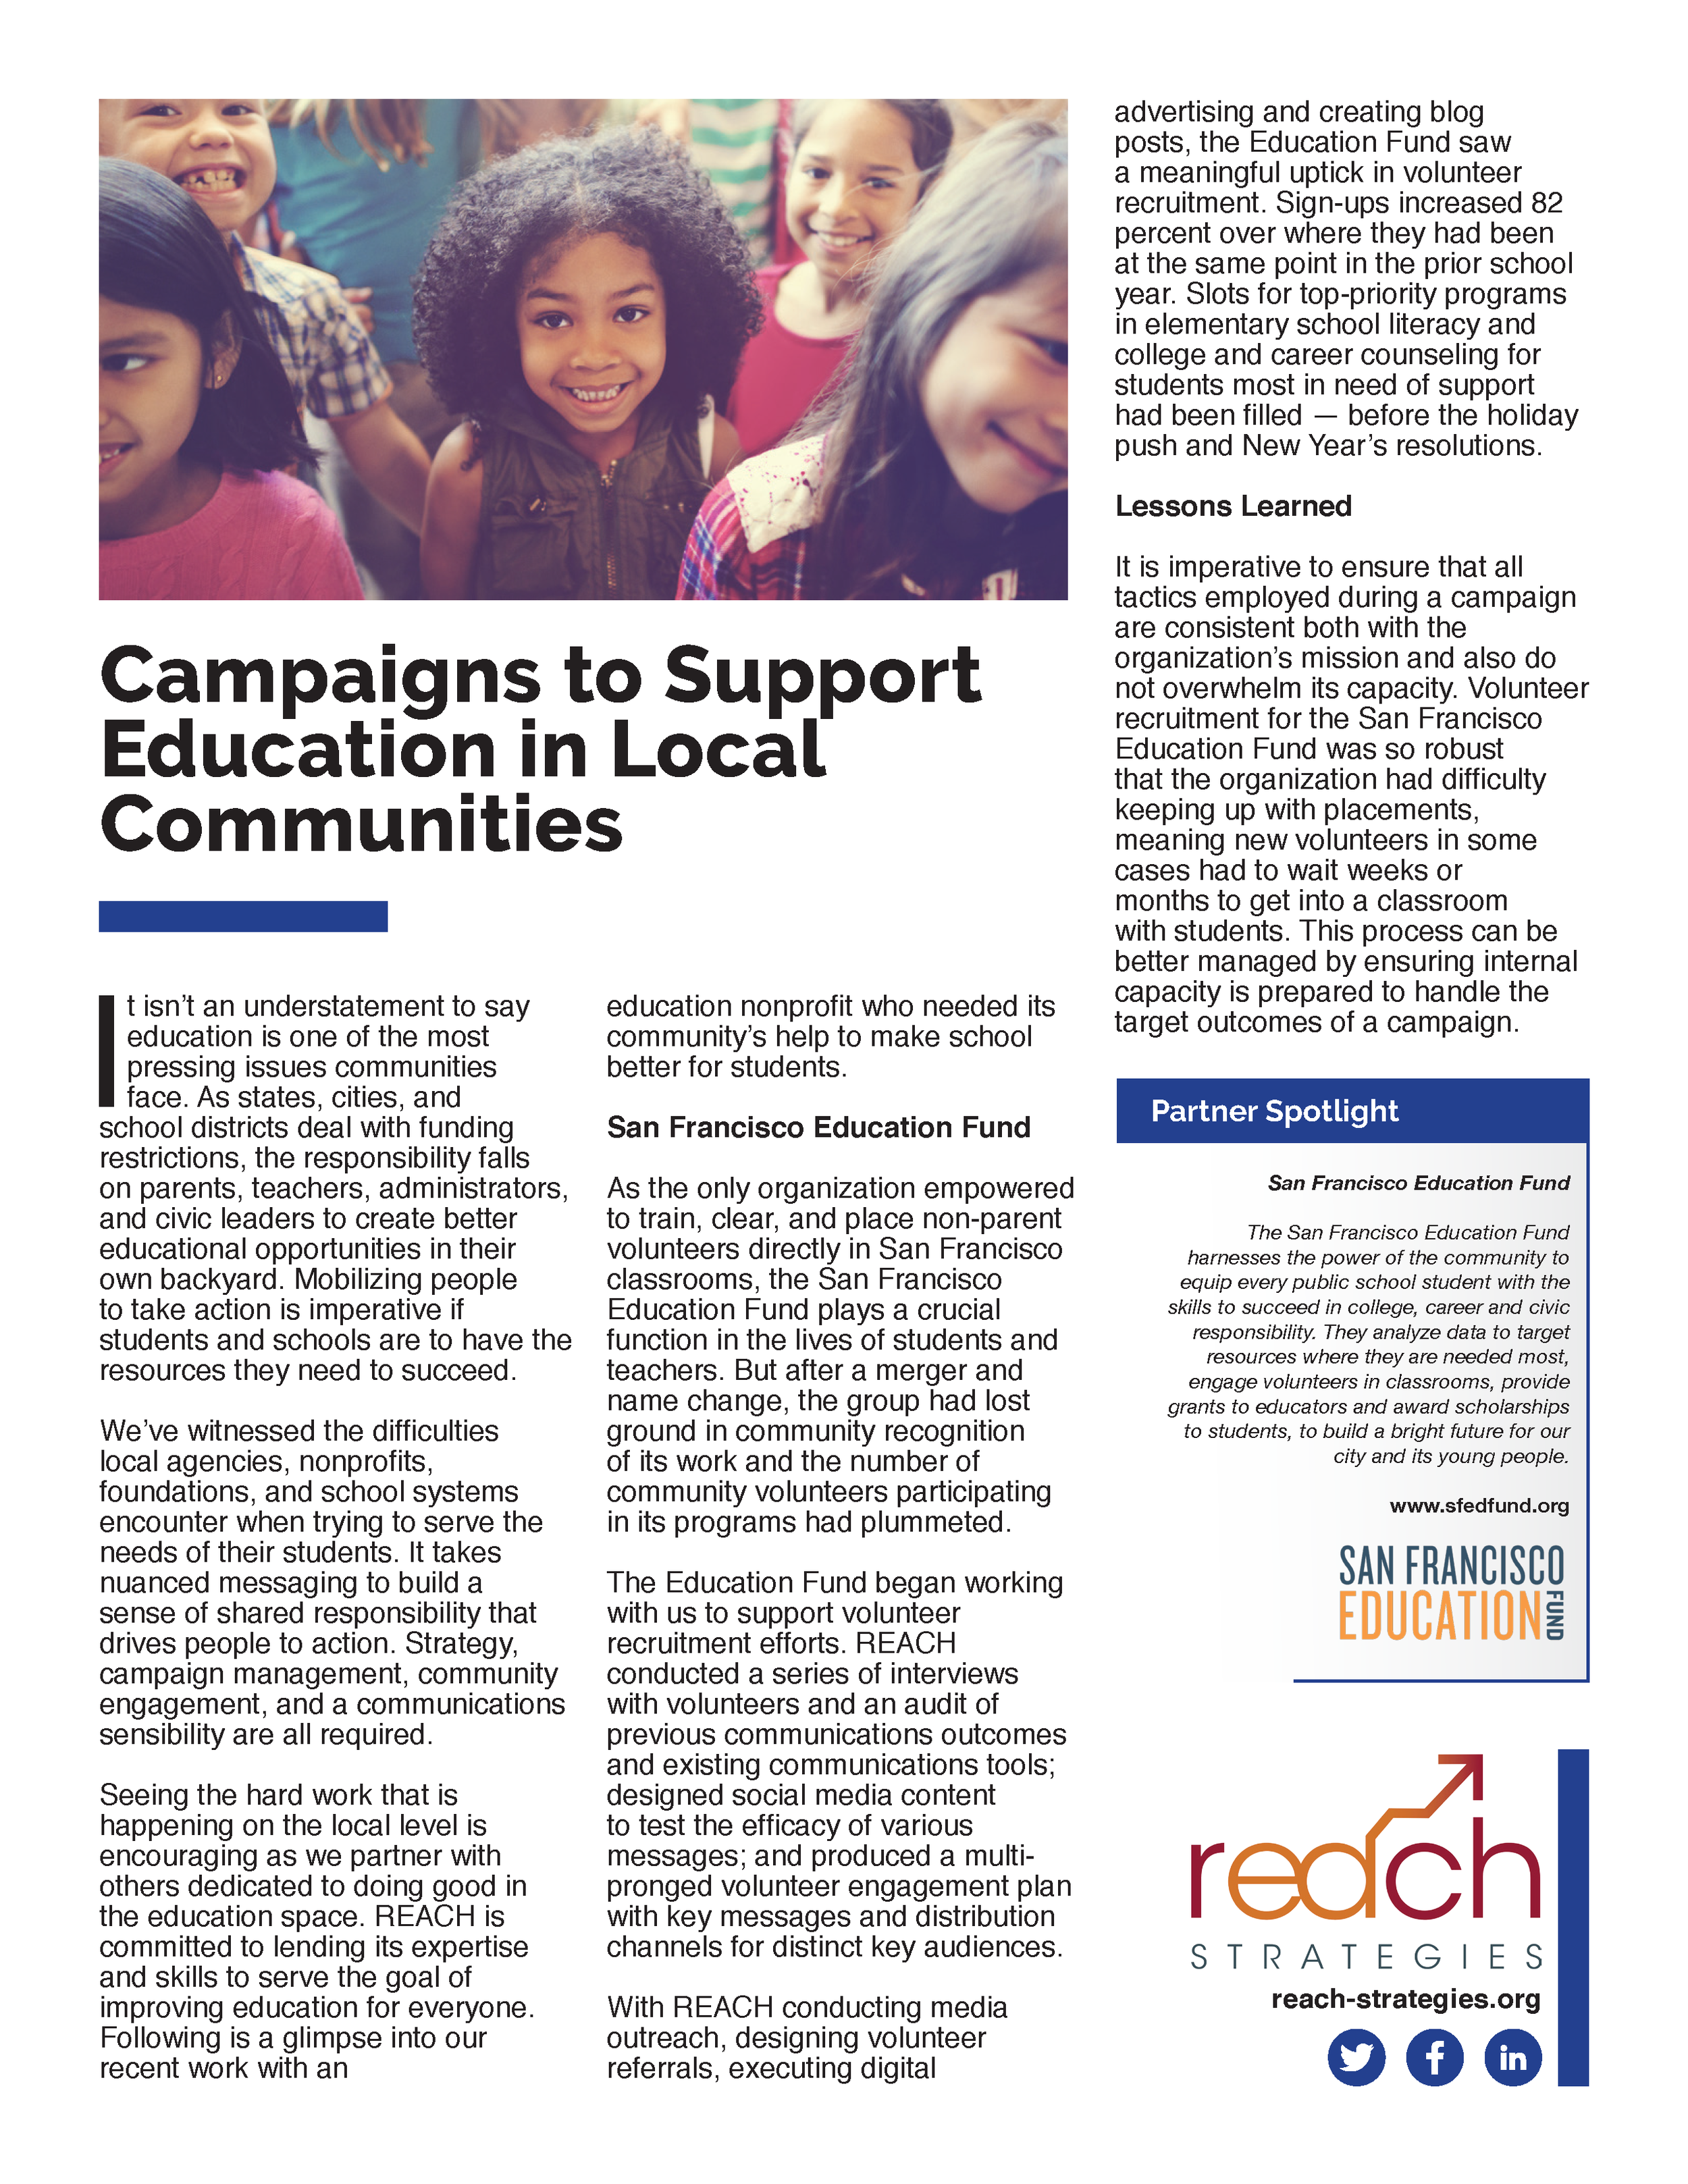 REACH_local_communities.png